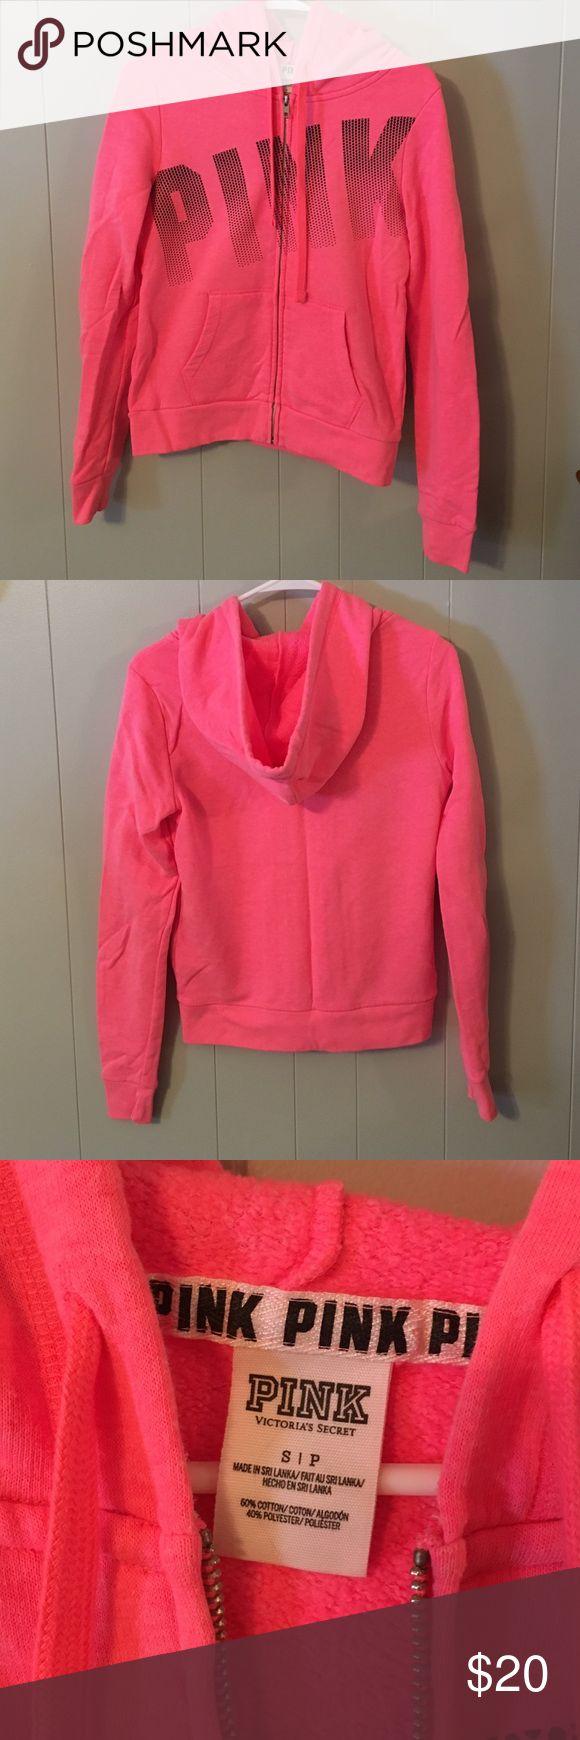 VS PINK hot pink Zip Up hoodie VS PINK hot pink Zip Up hoodie. Black lettering on front. Great condition. Worn 2-3 times. PINK Victoria's Secret Tops Sweatshirts & Hoodies